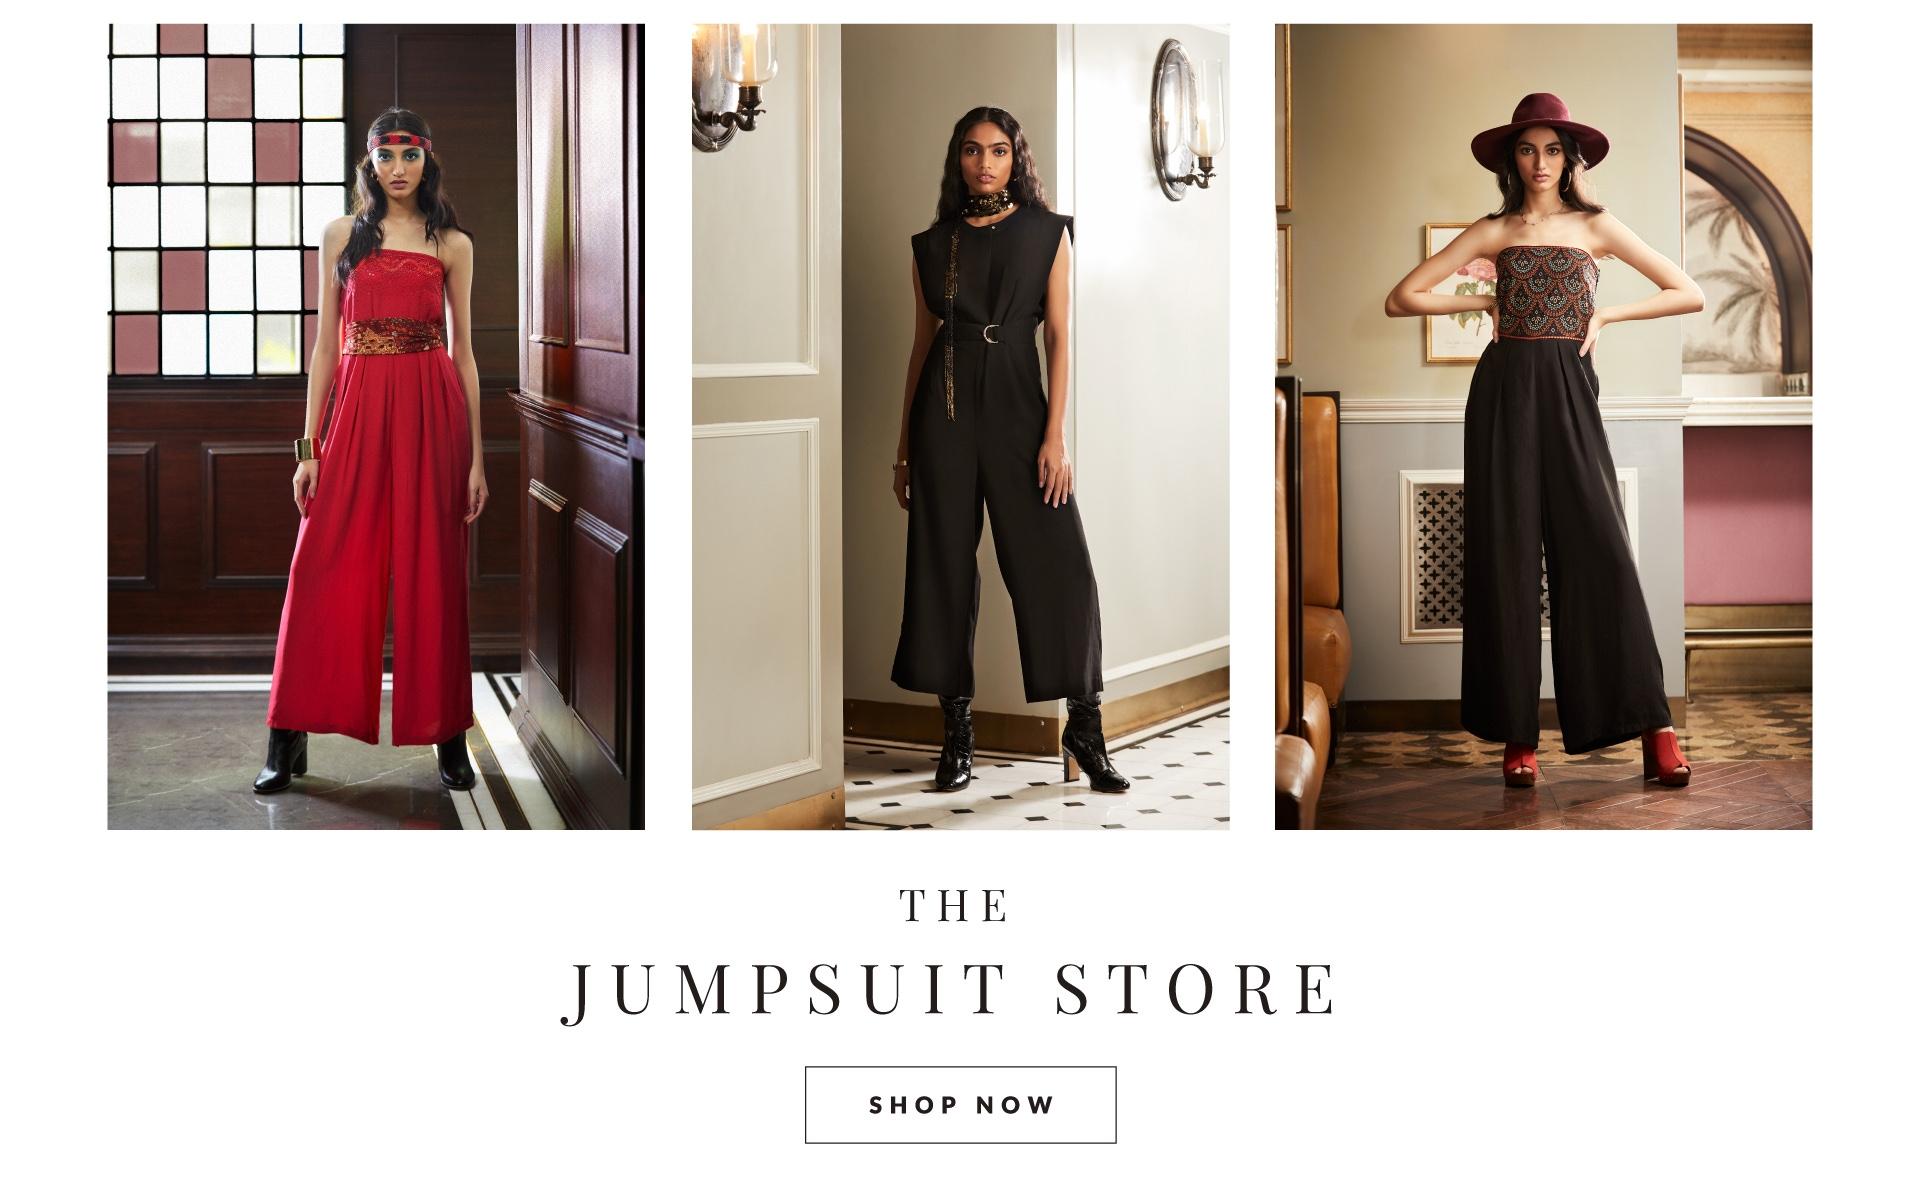 The Jumpsuit Store